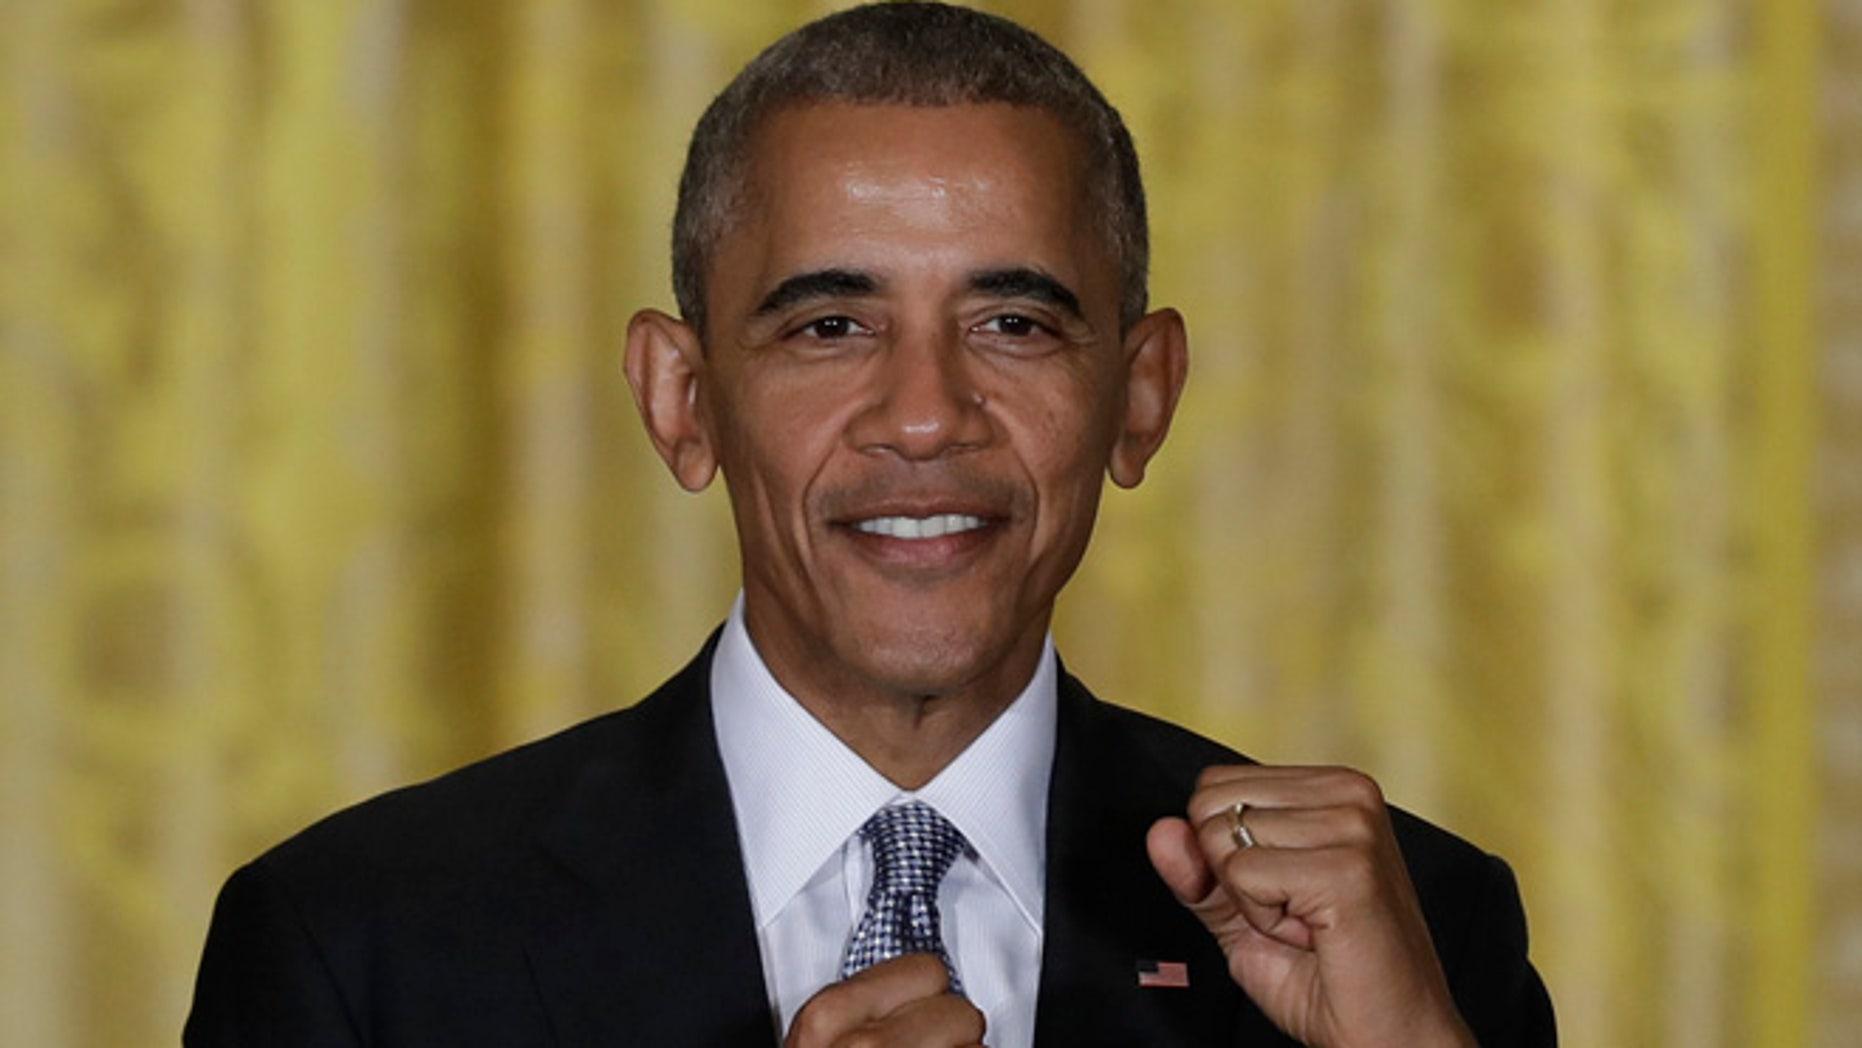 President Barack Obama in the East Room of the White House, Wednesday, Oct. 12, 2016.